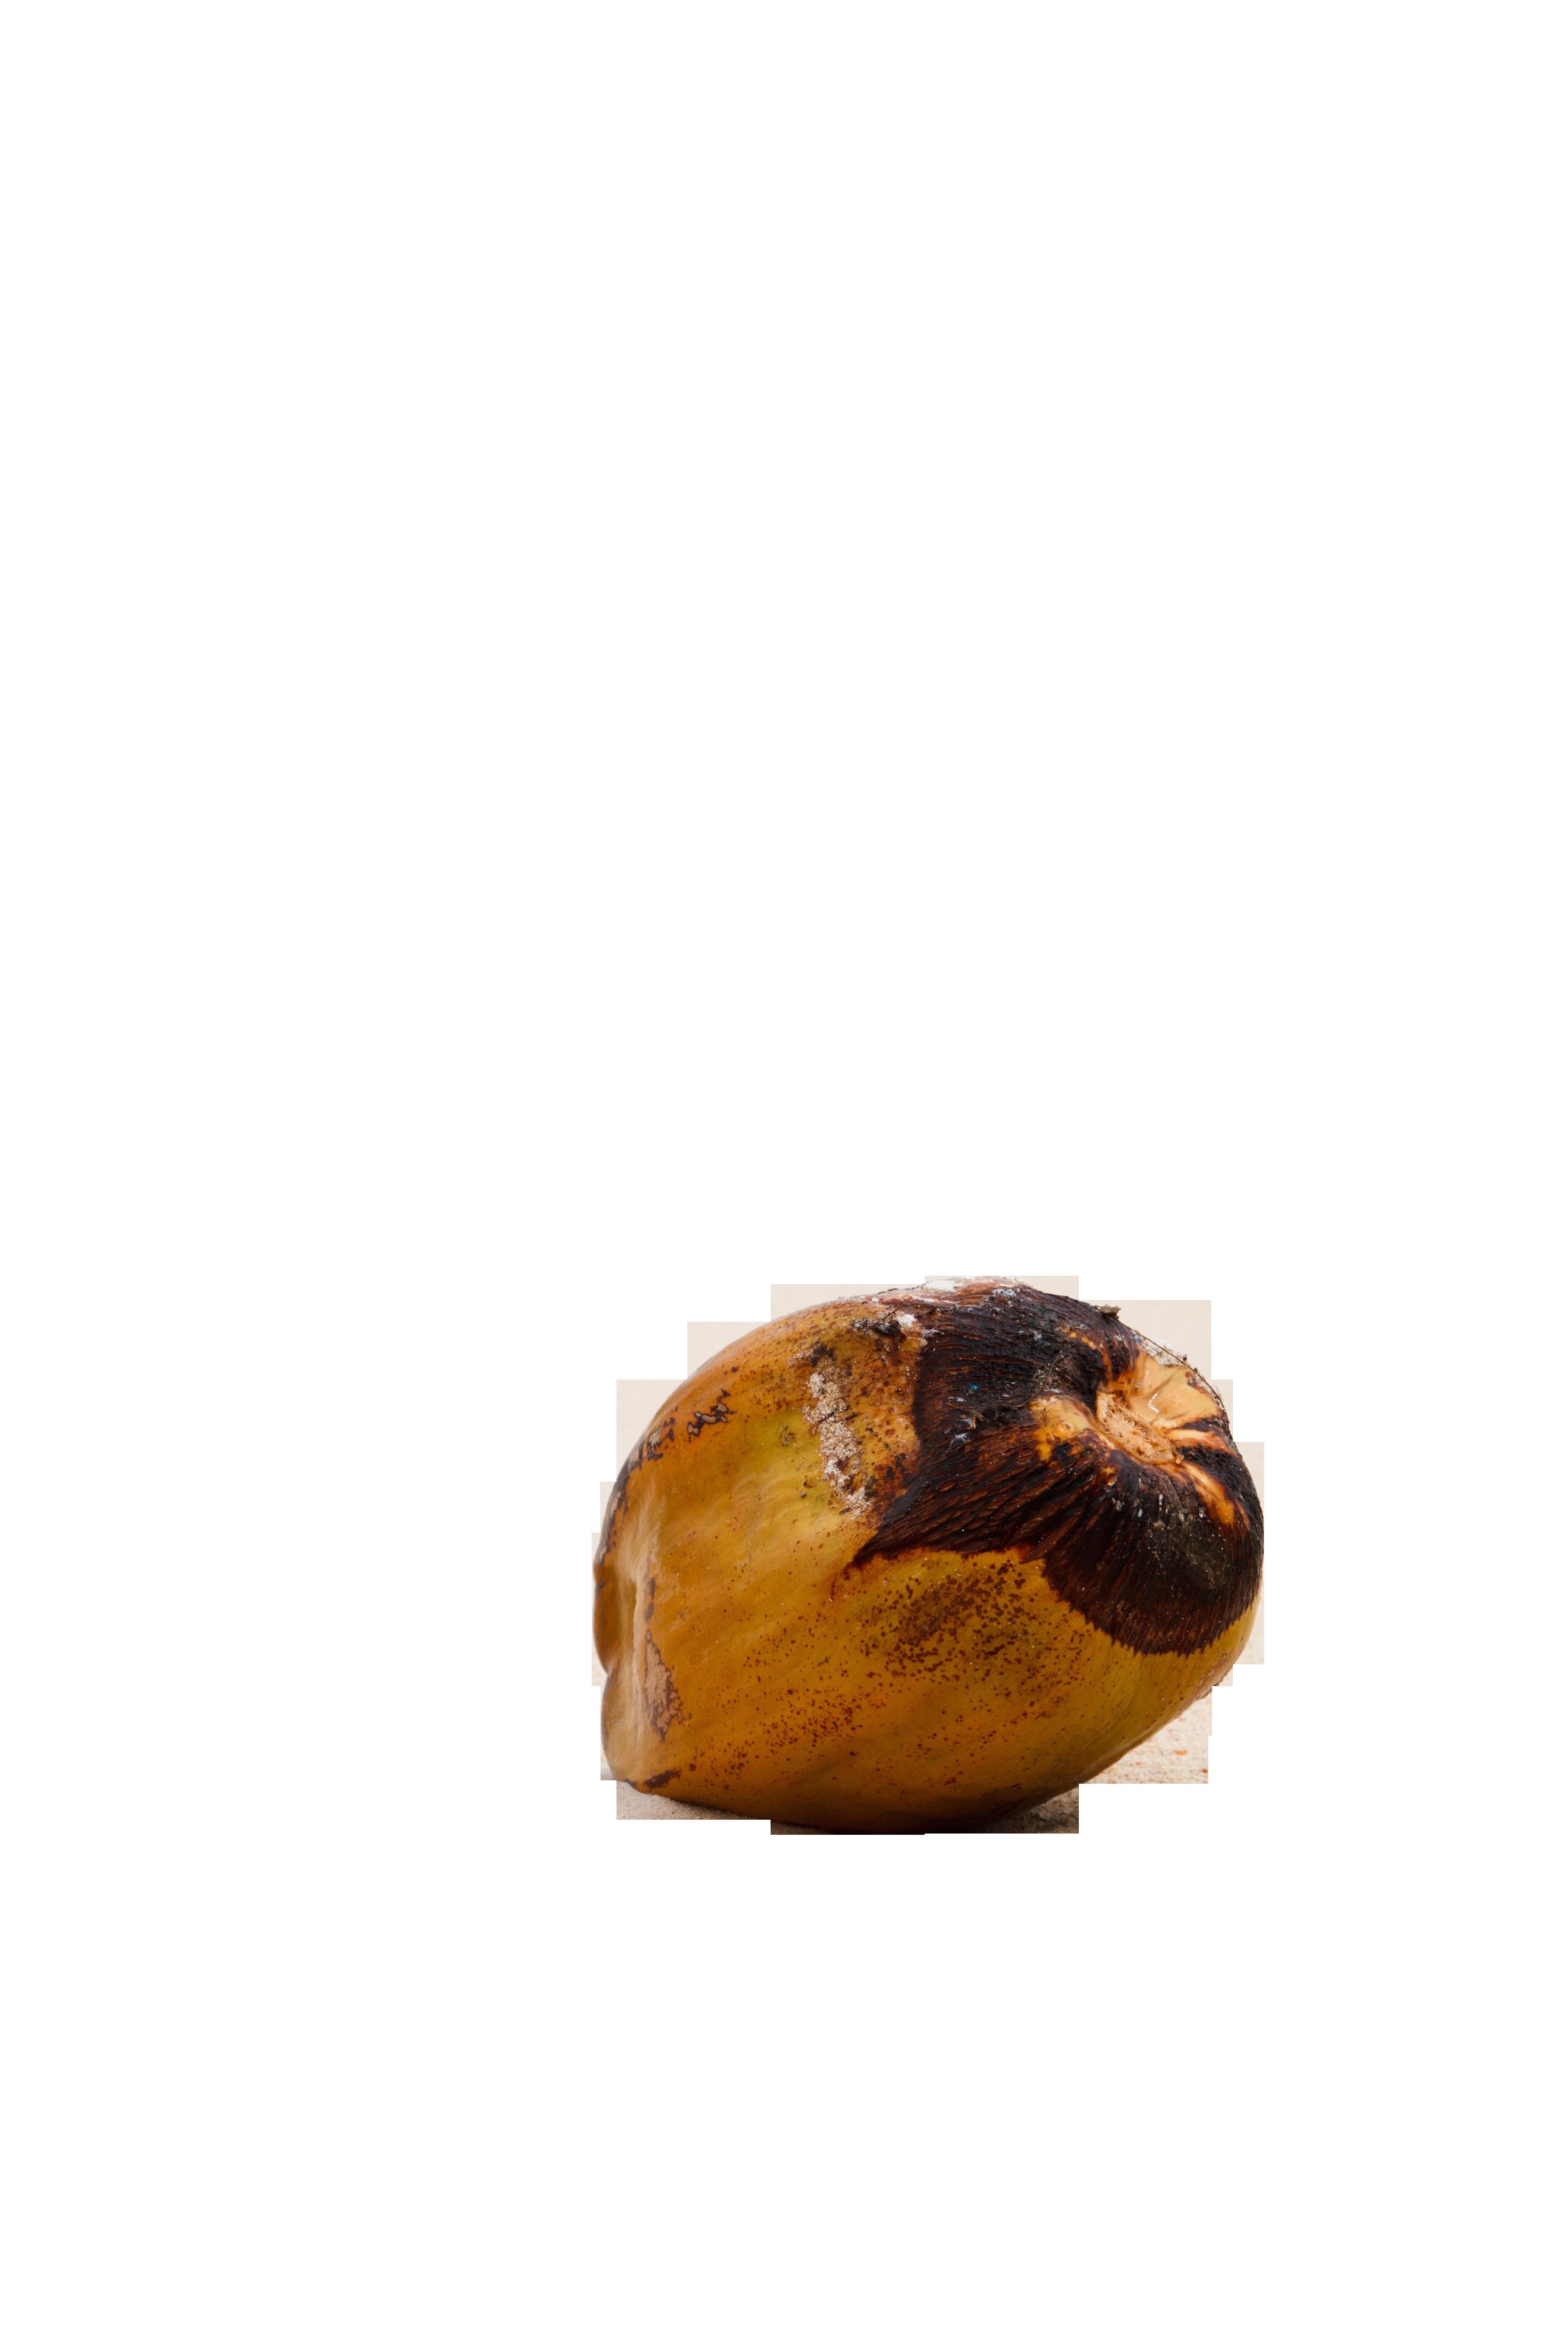 coconut-84539_Clip